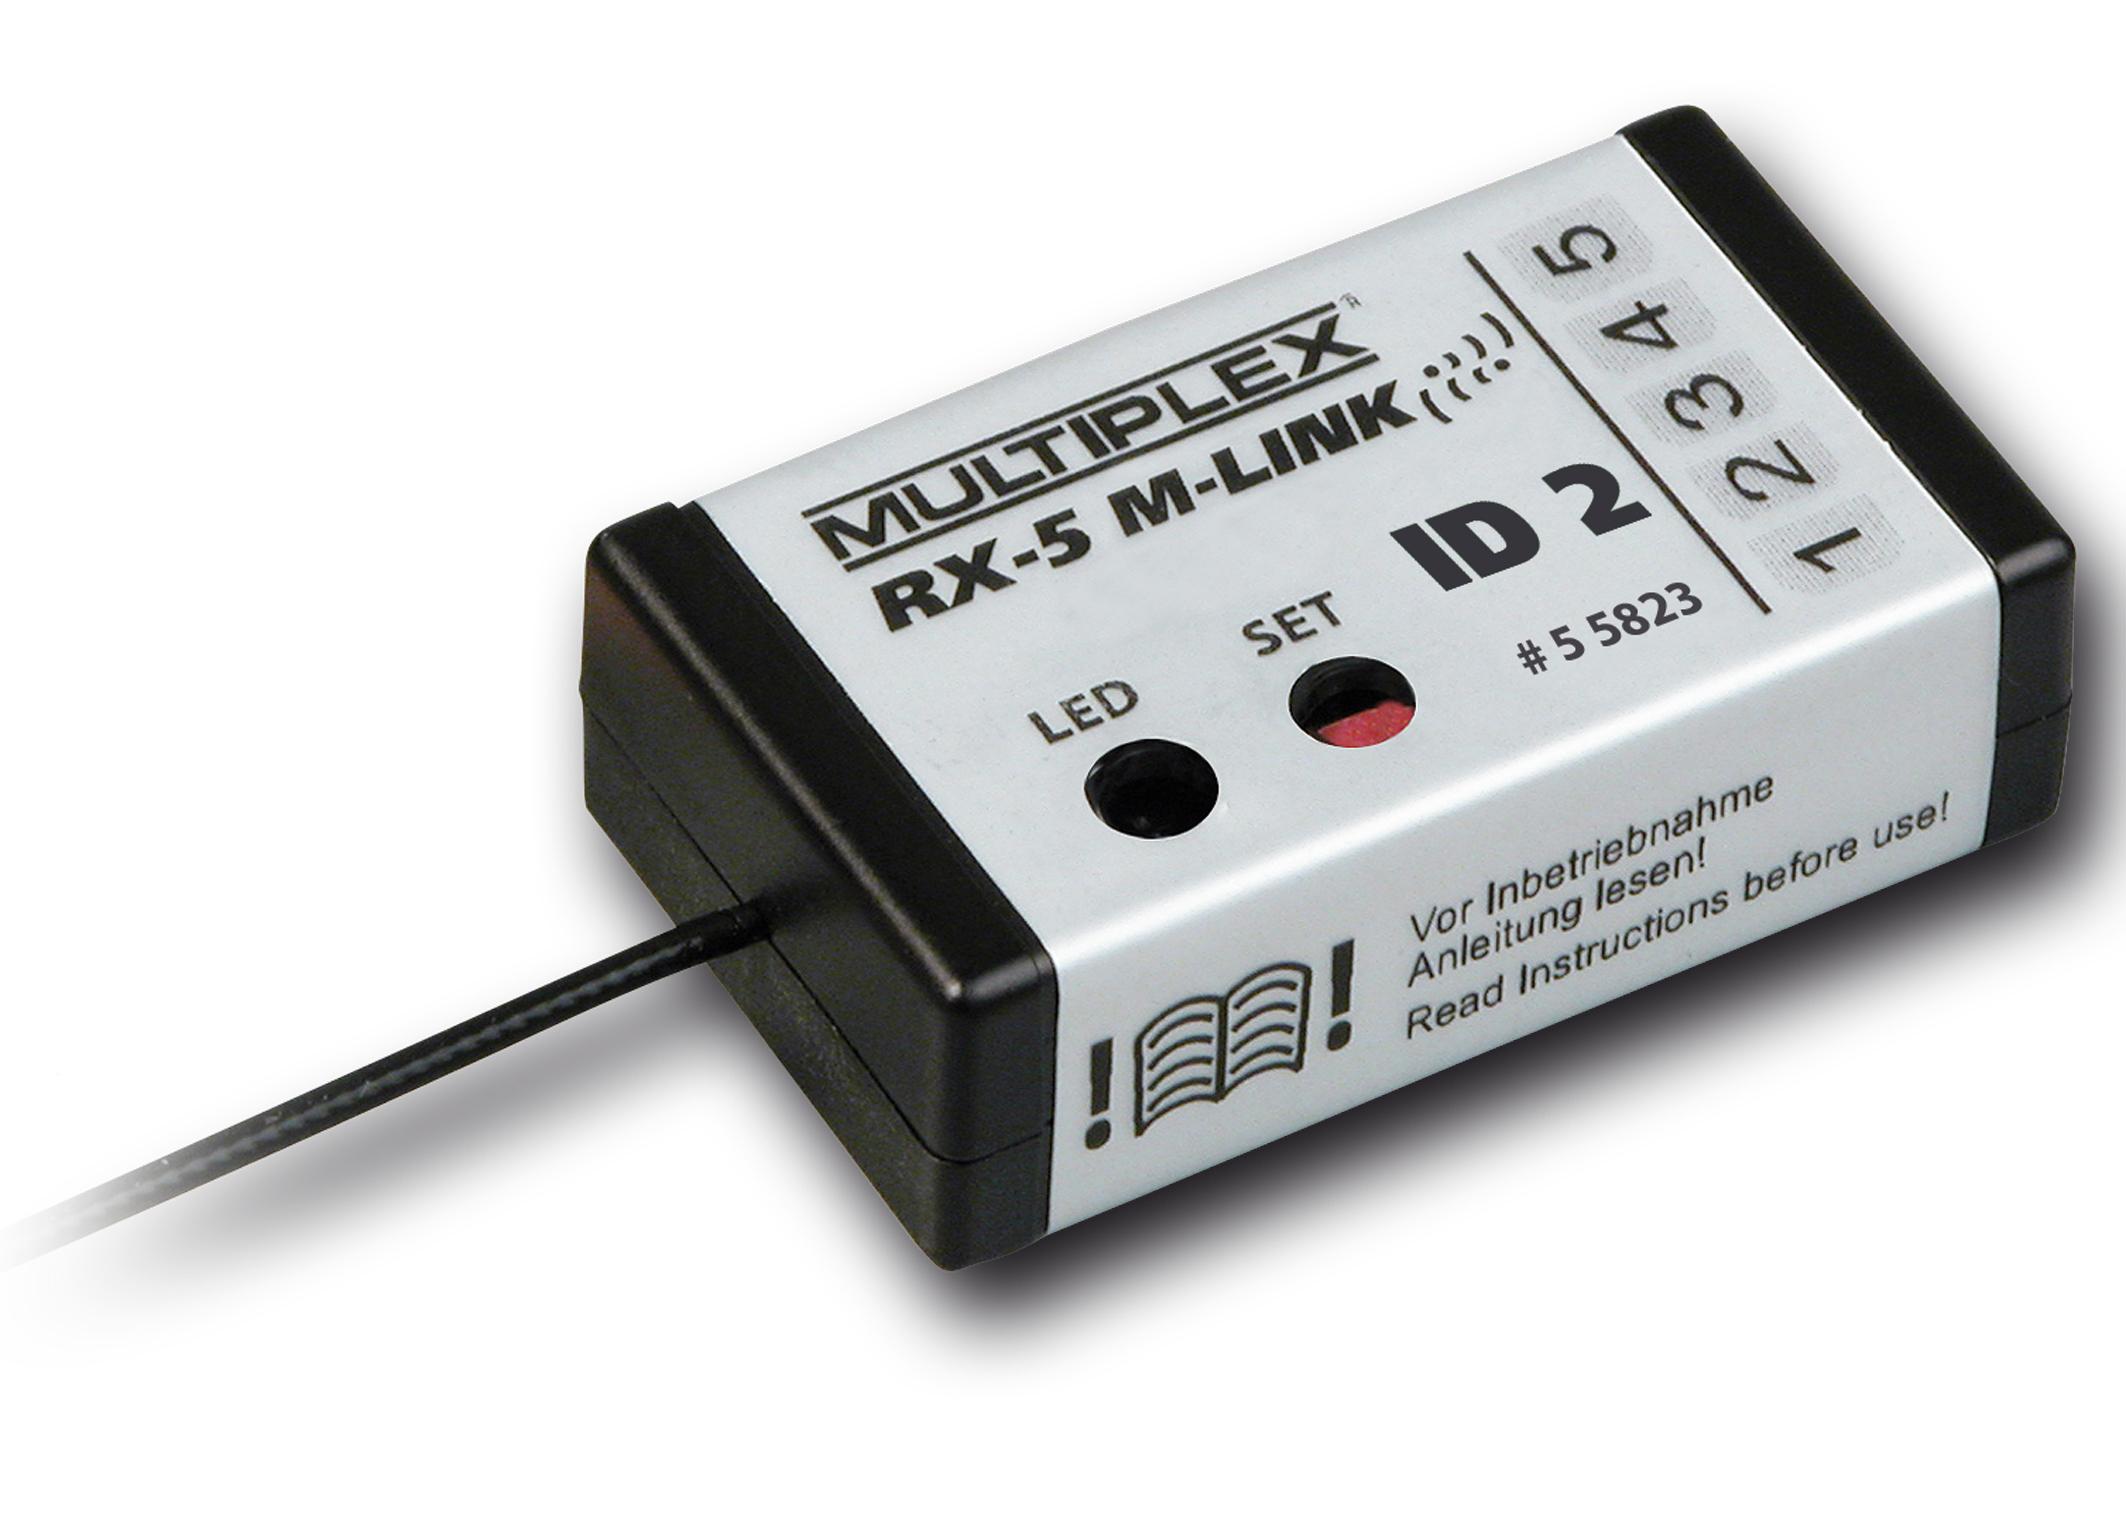 Multiplex Empfänger RX-5 M-LINK ID 2 EasyStar II